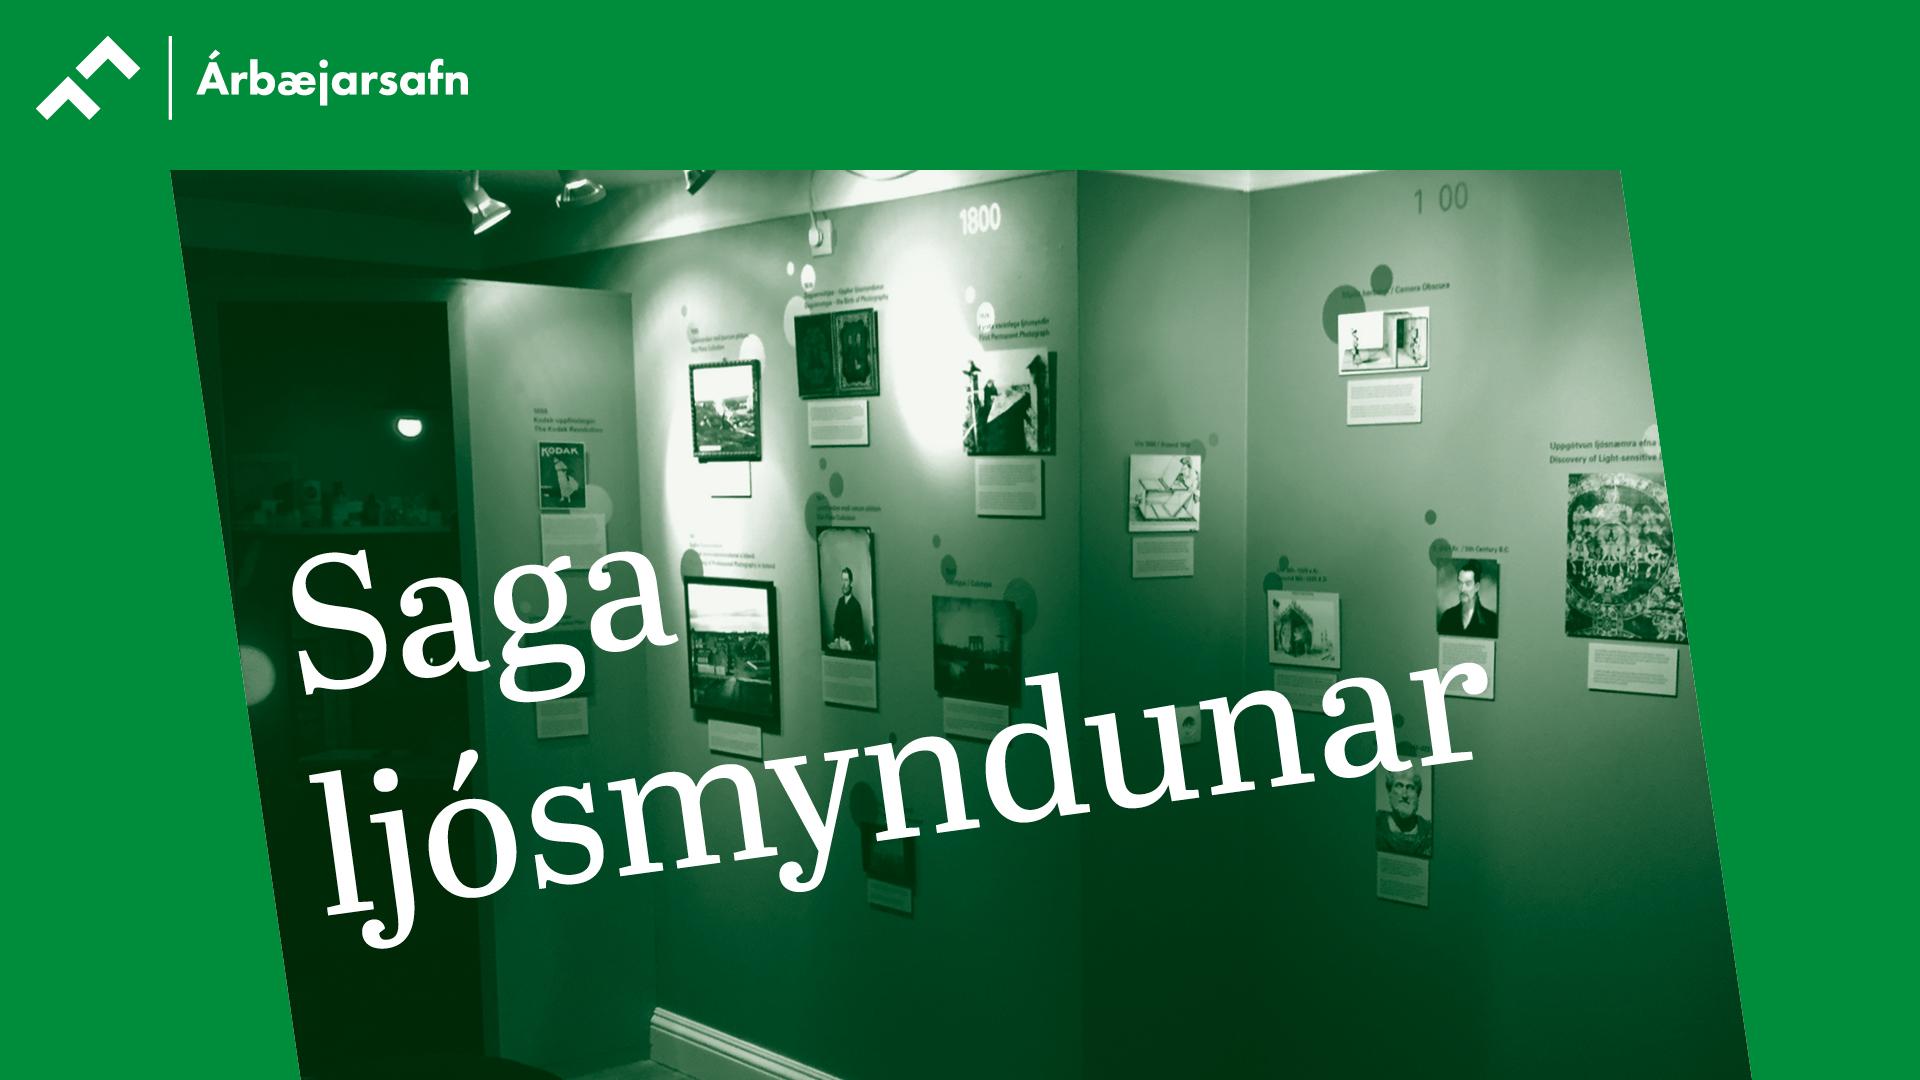 bss-banners-sagaljosmyndunar-1920x1080.jpg